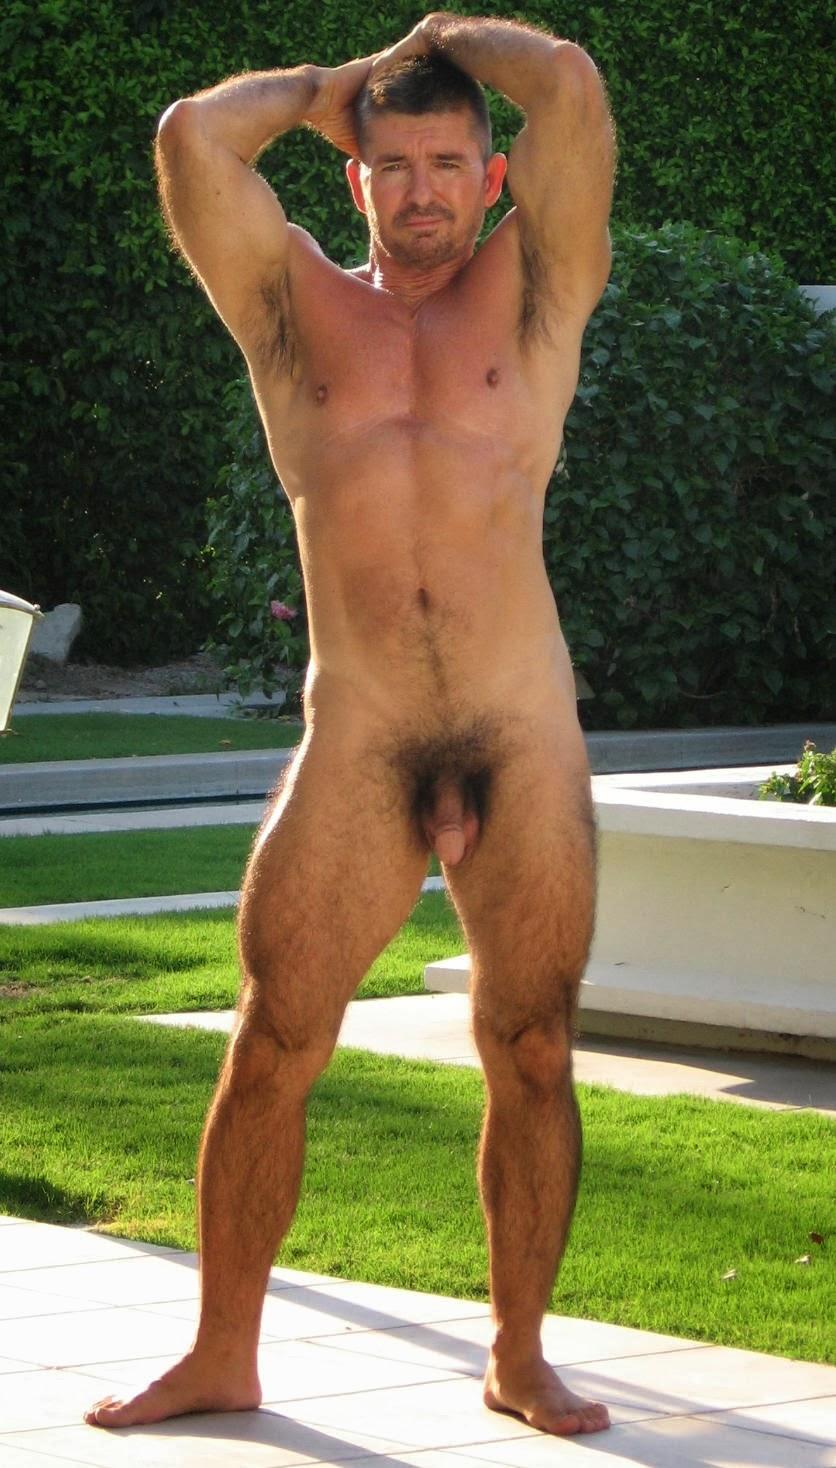 kardashian-getting-naked-sportsmen-with-girl-porn-babes-porn